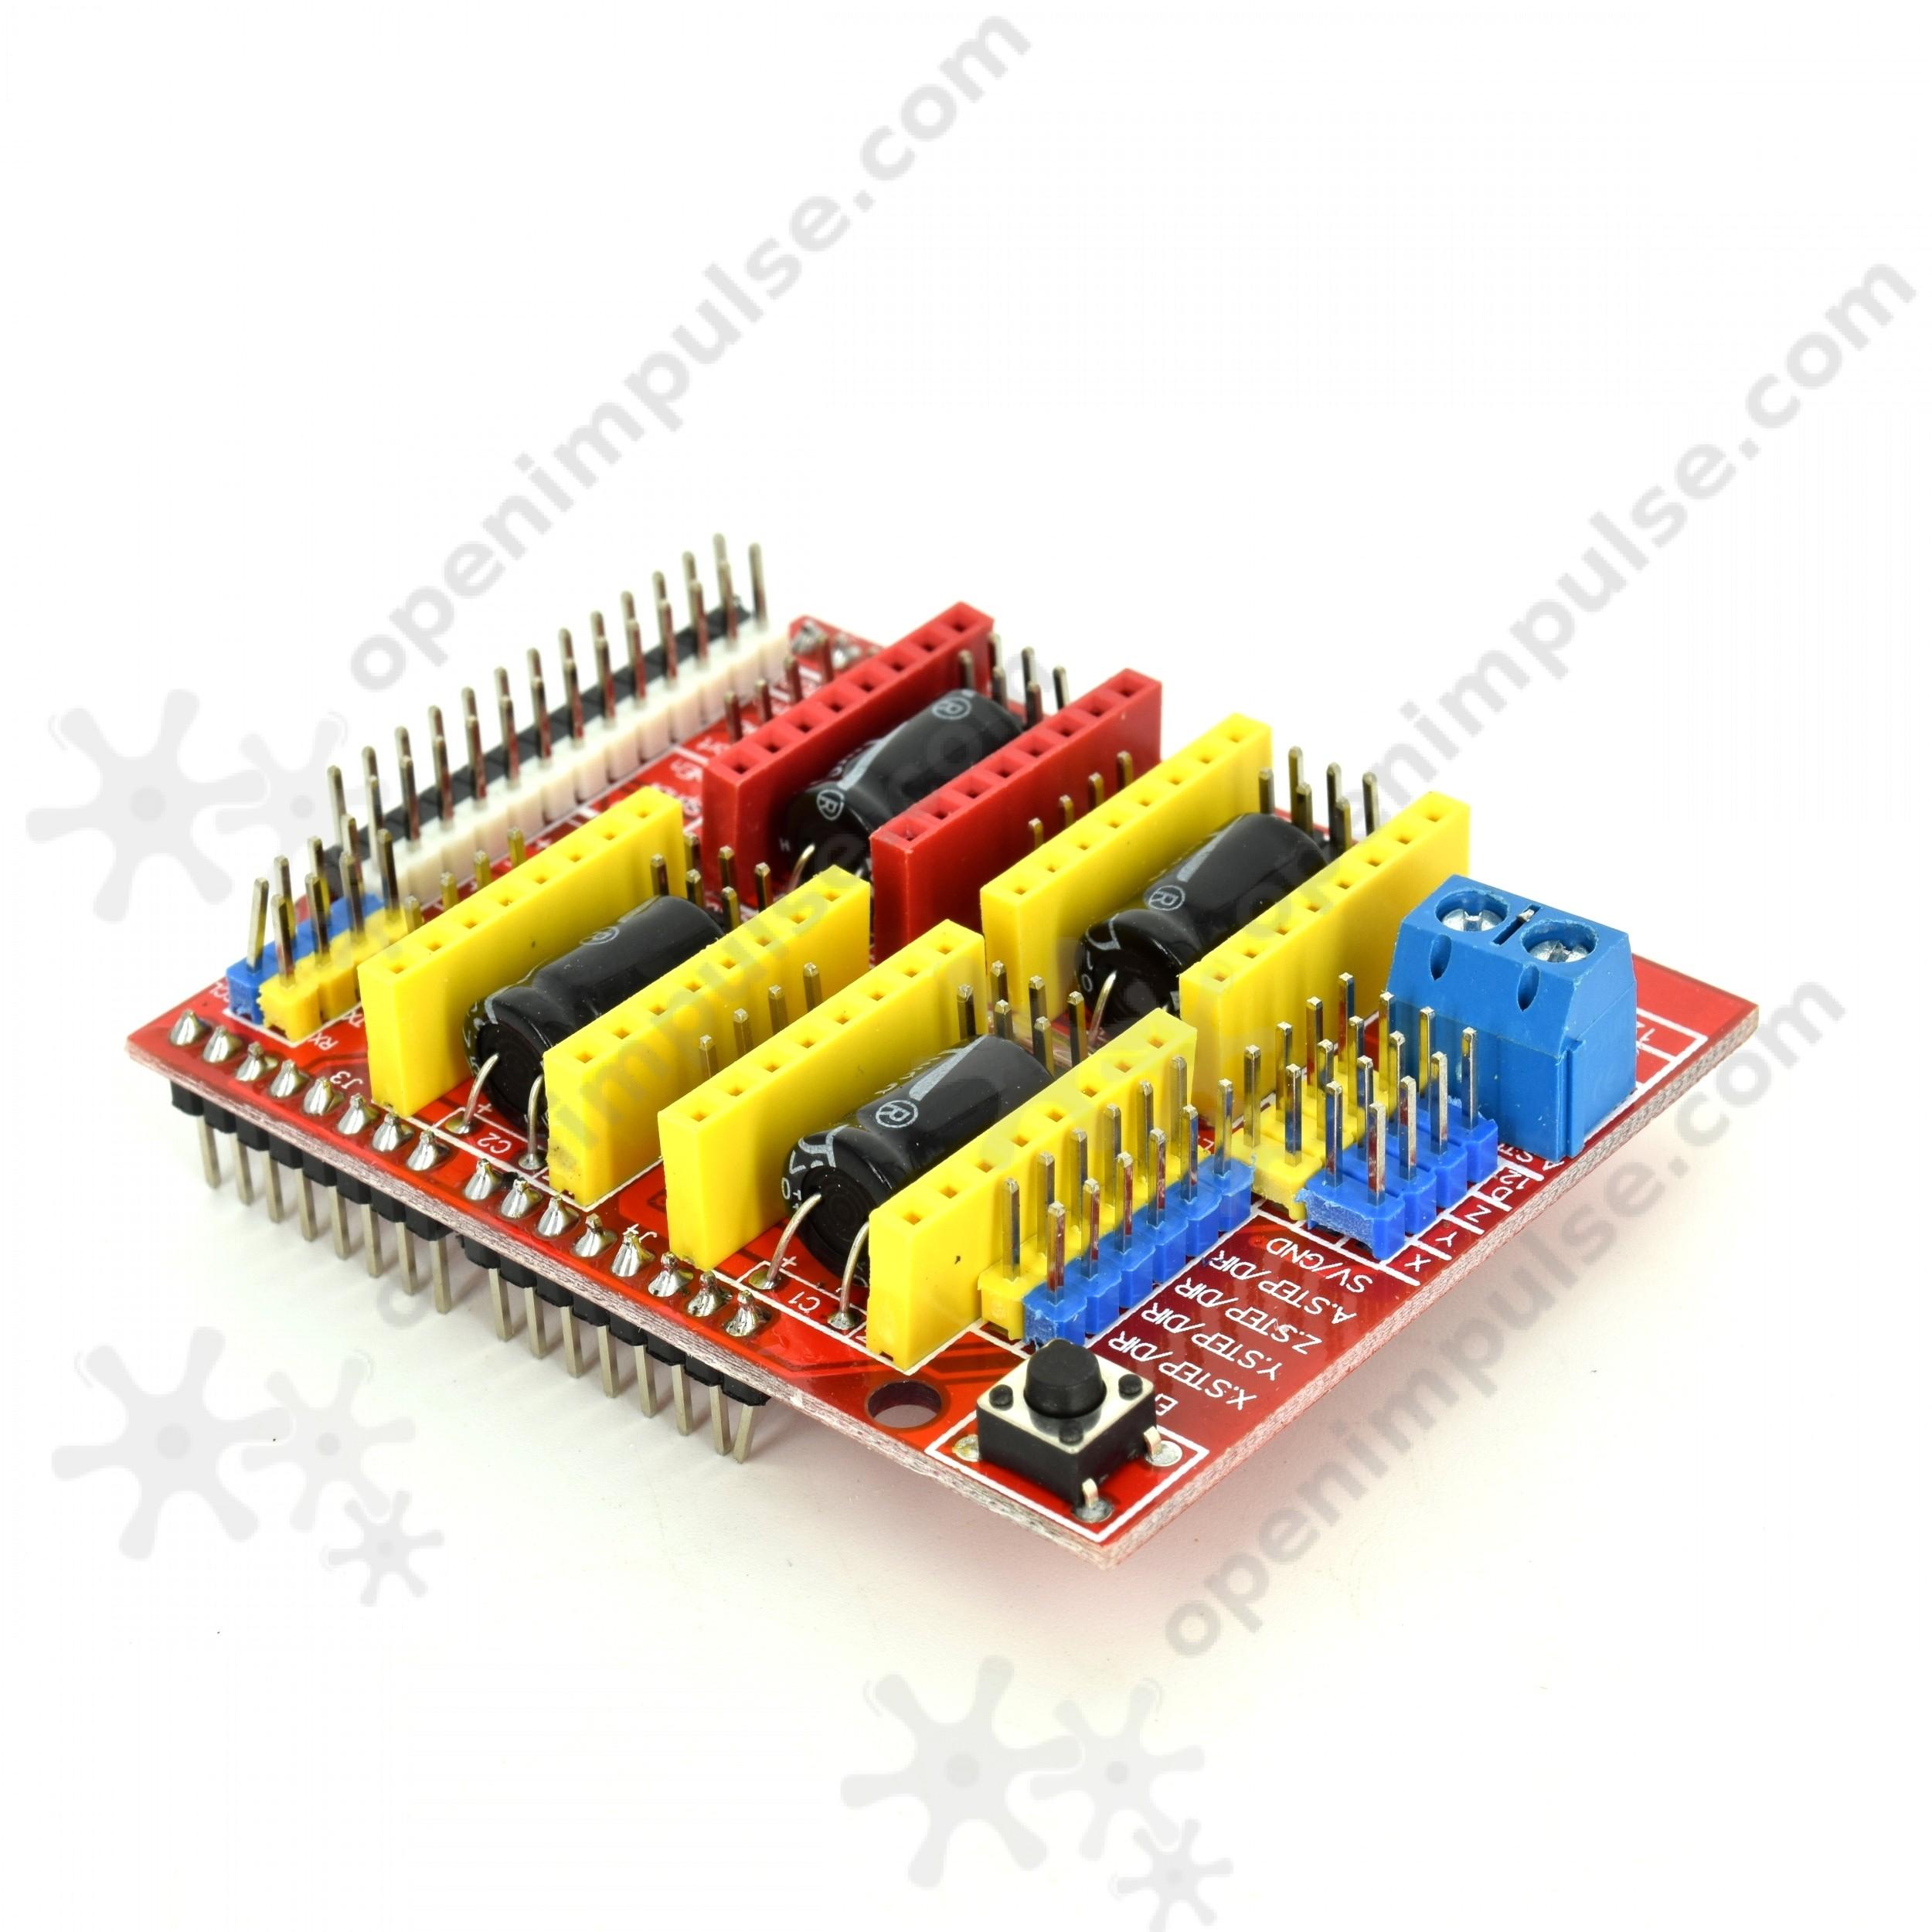 A4988 CNC Shield v3 for Arduino | Open ImpulseOpen Impulse